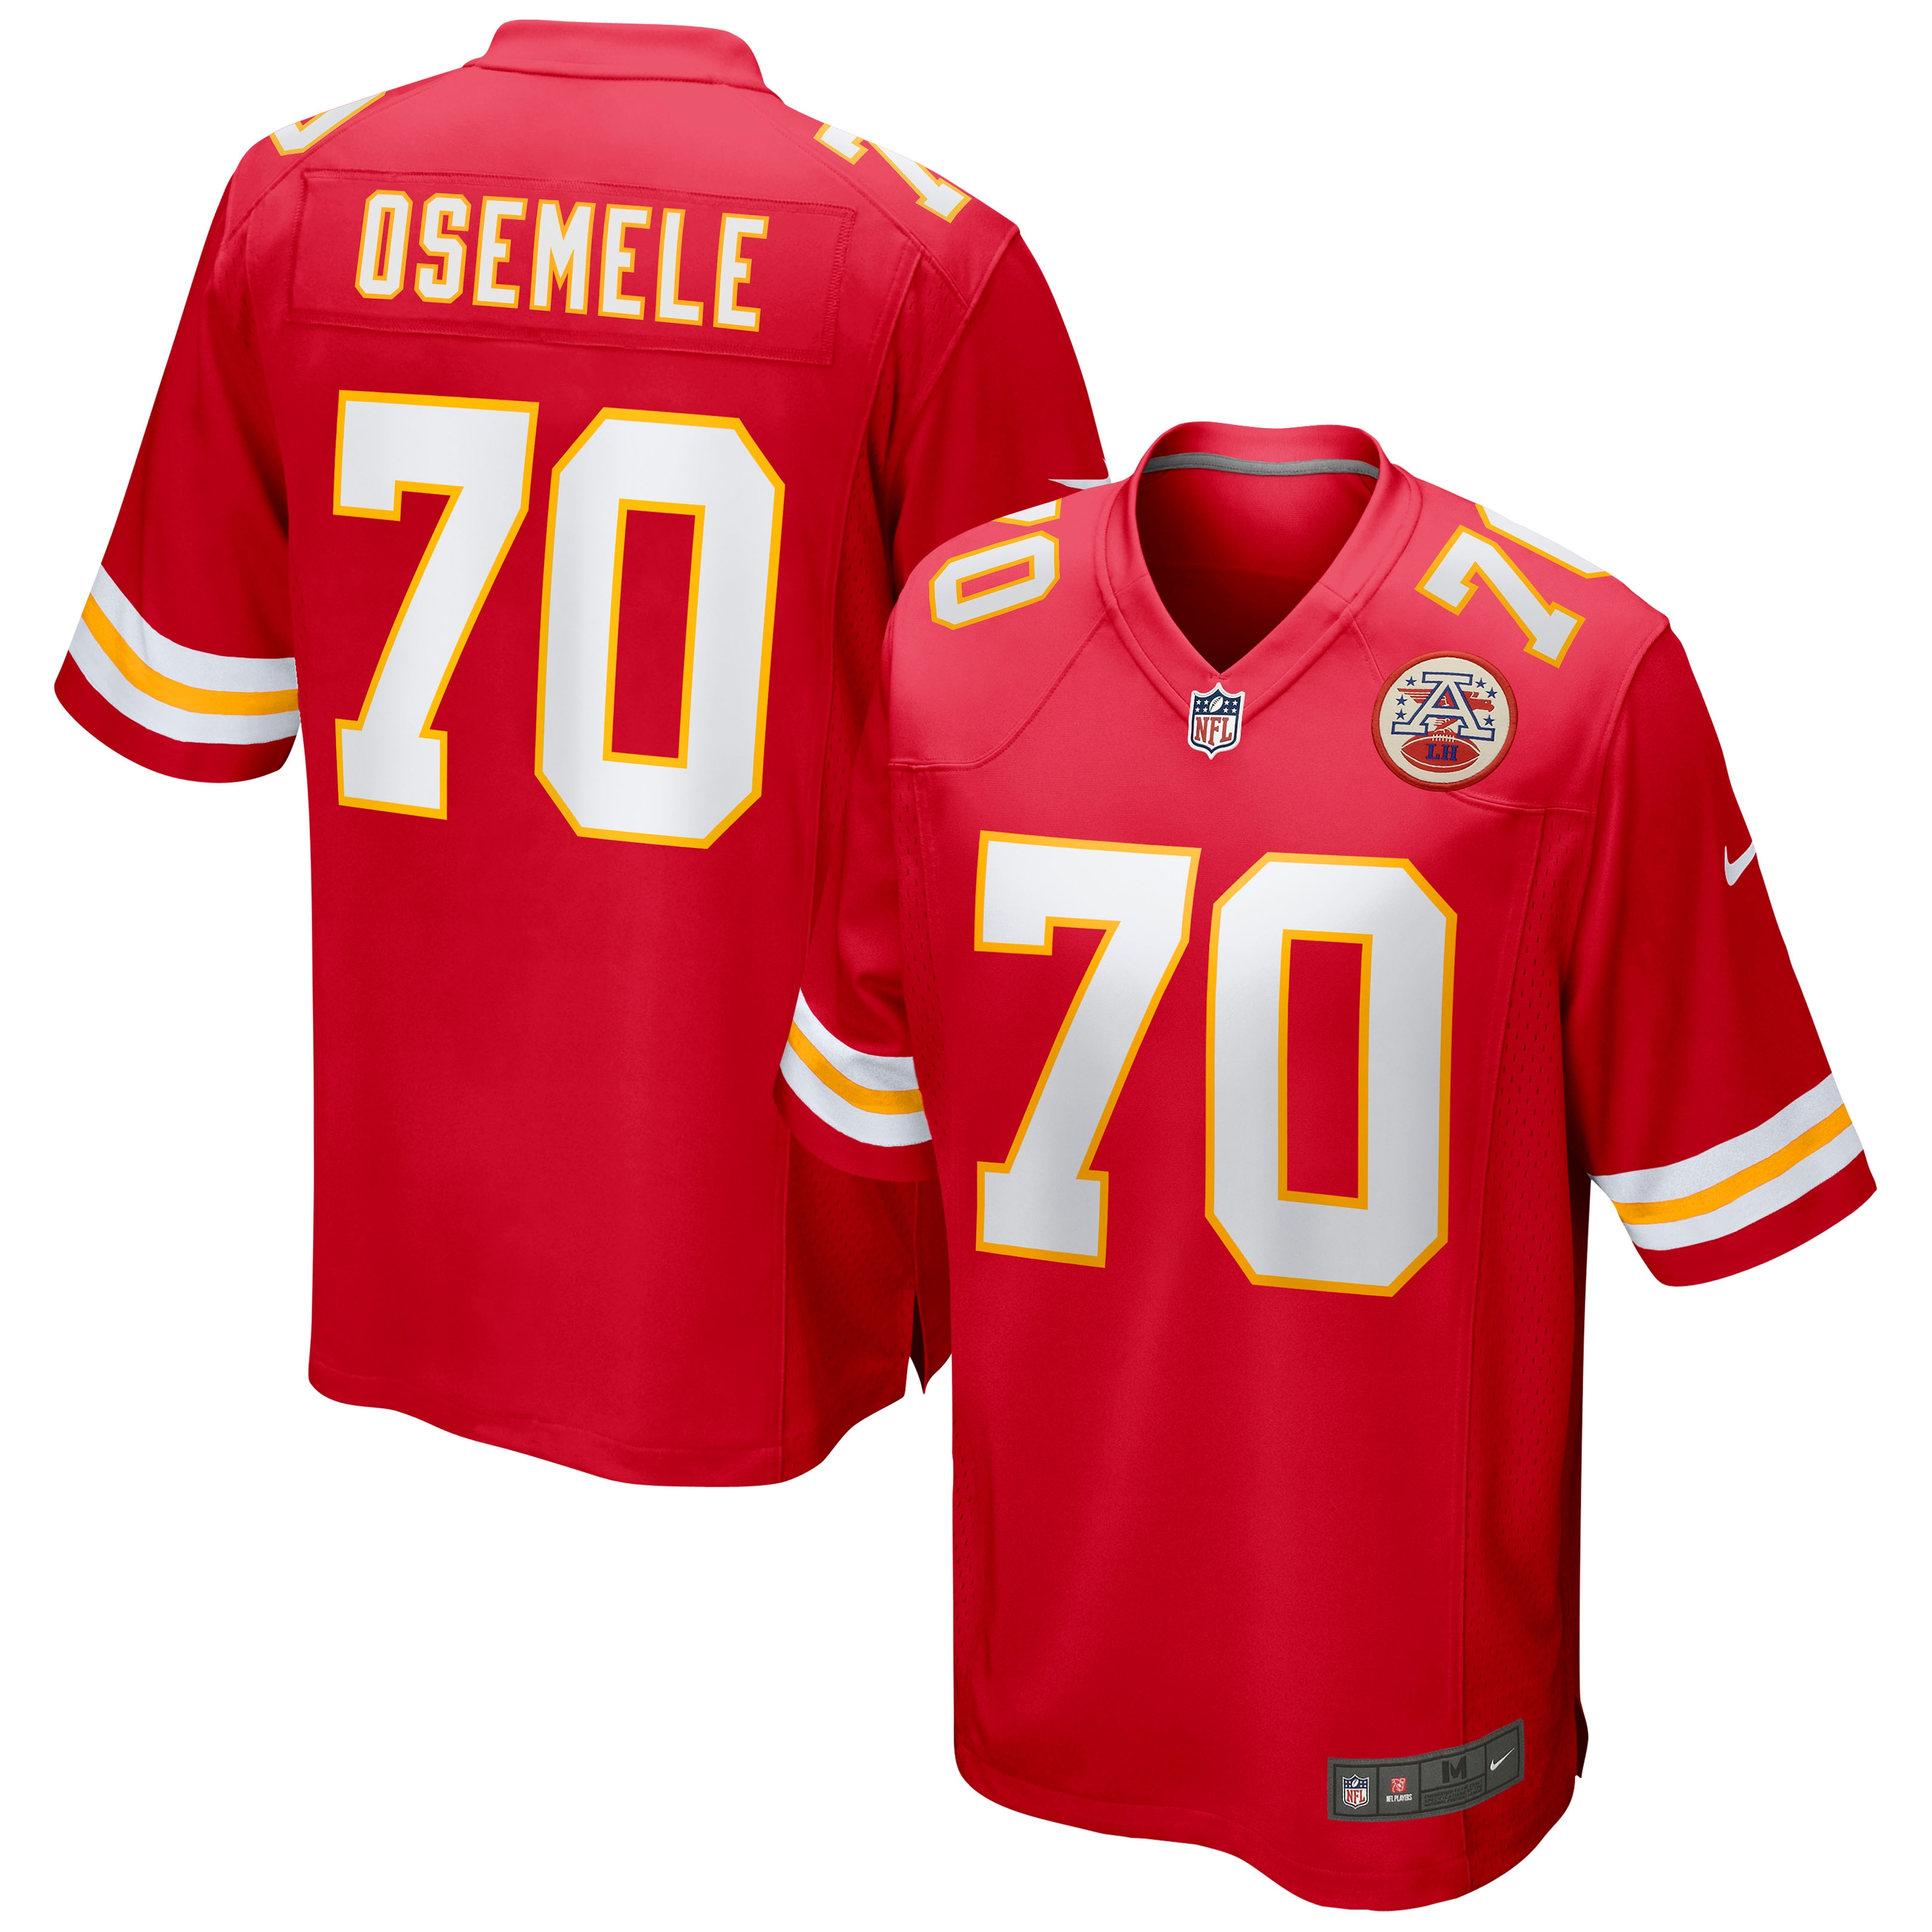 Kelechi Osemele Kansas City Chiefs Nike Game Jersey - Red - Walmart.com